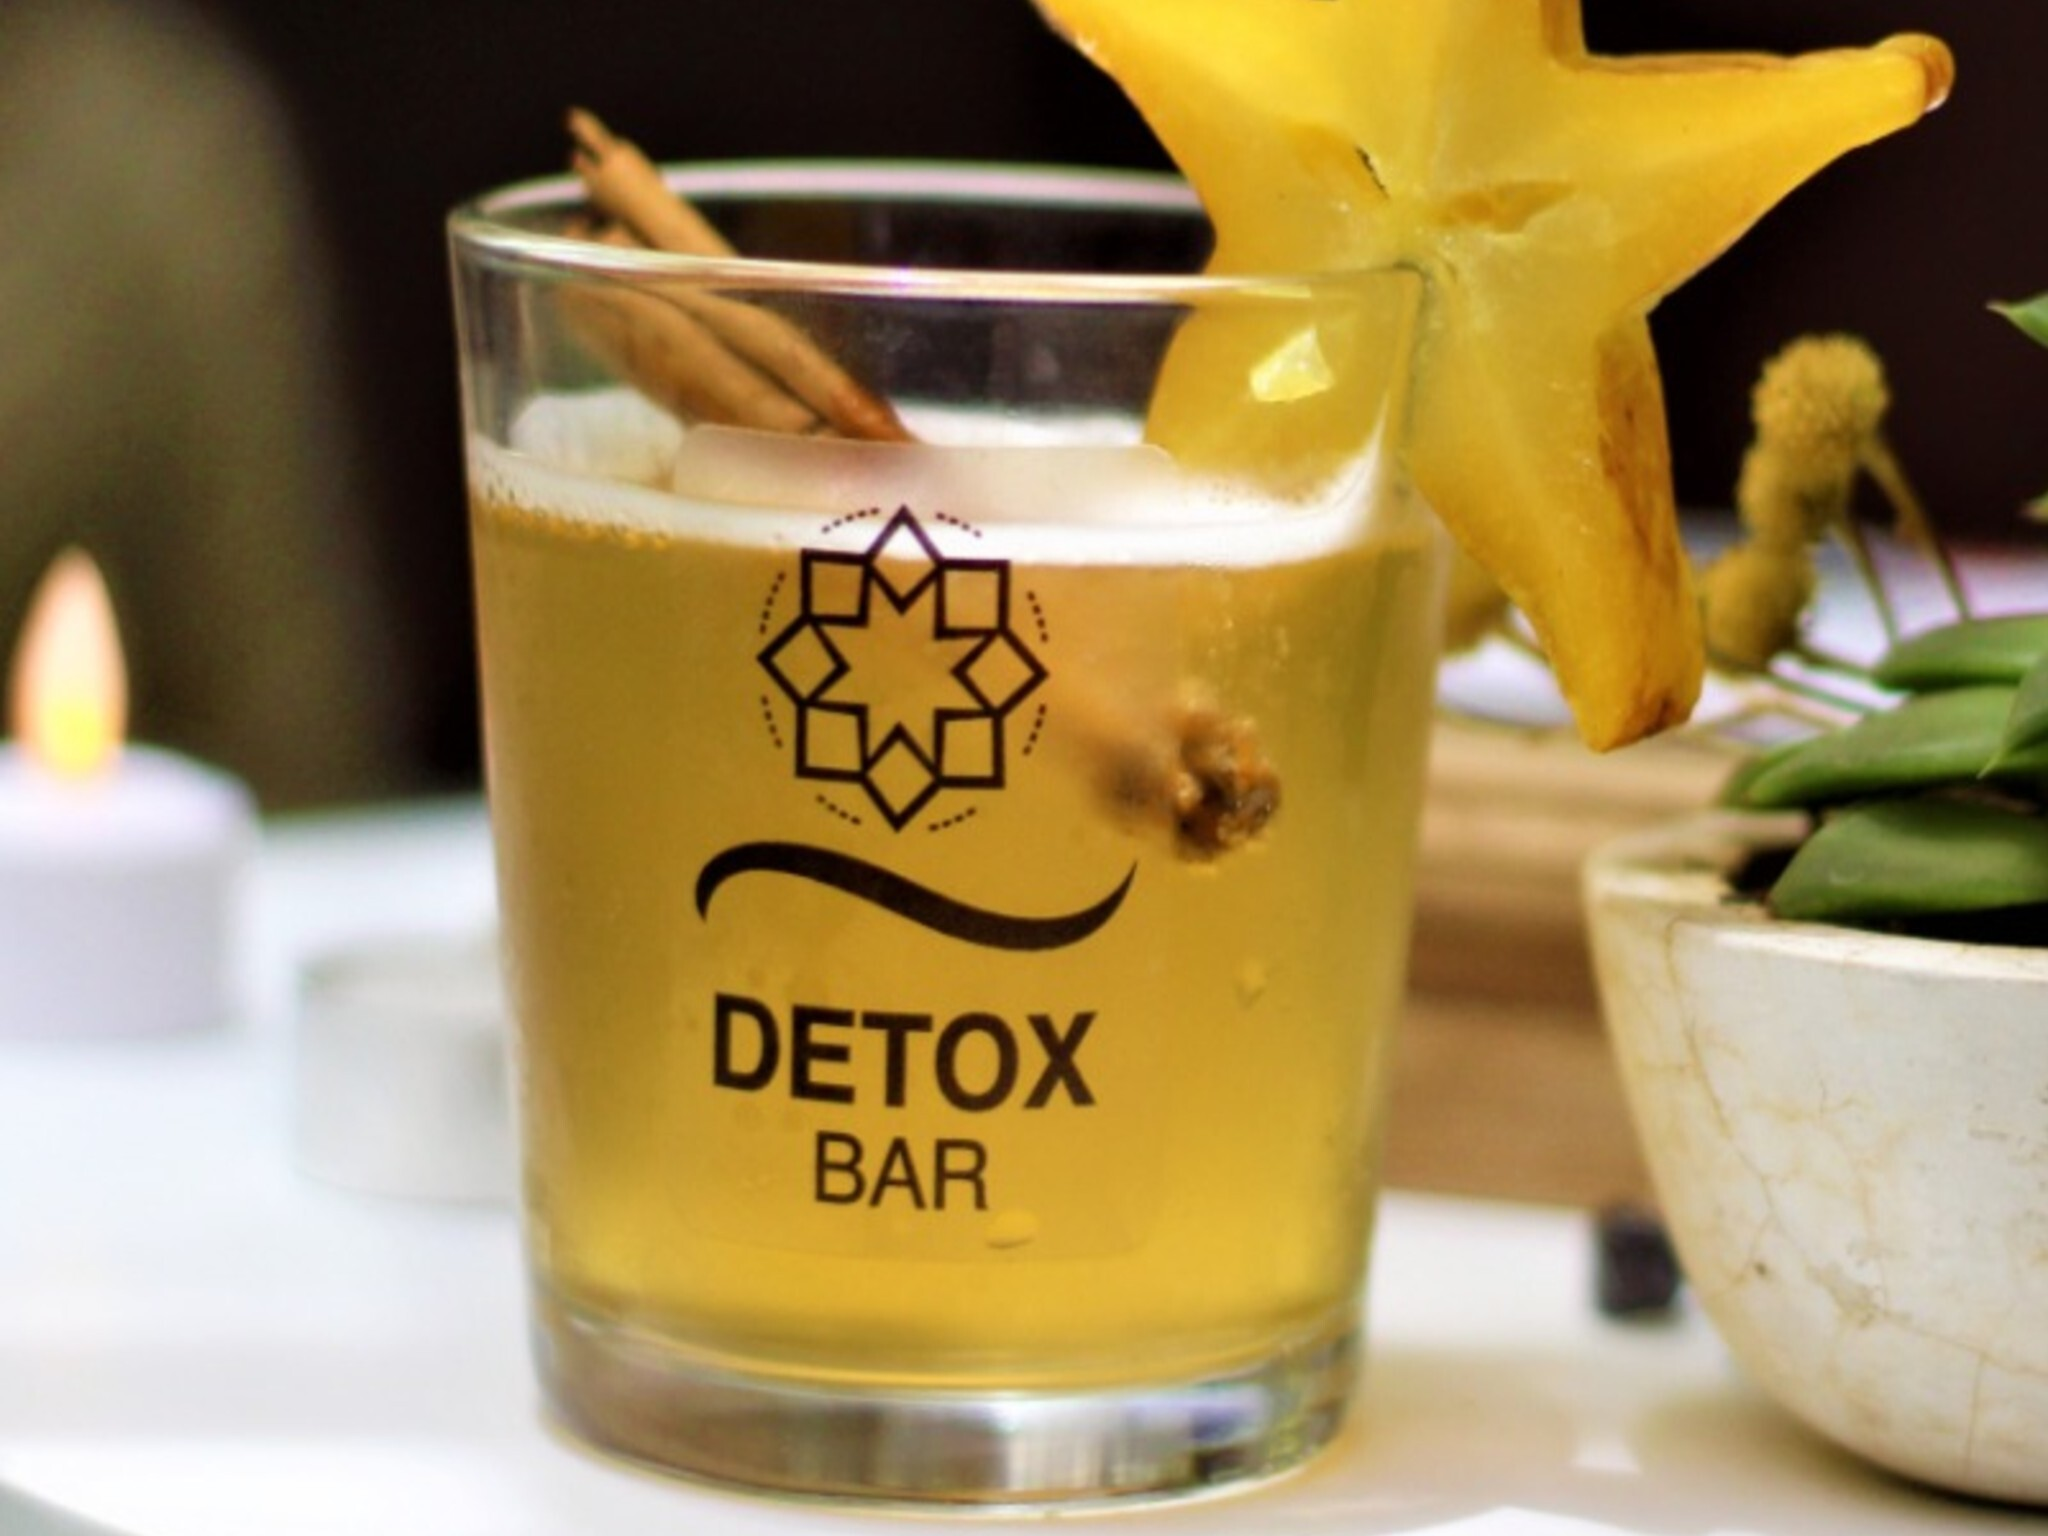 Vitali Detox Bar coctel de kombucha con maracuyá